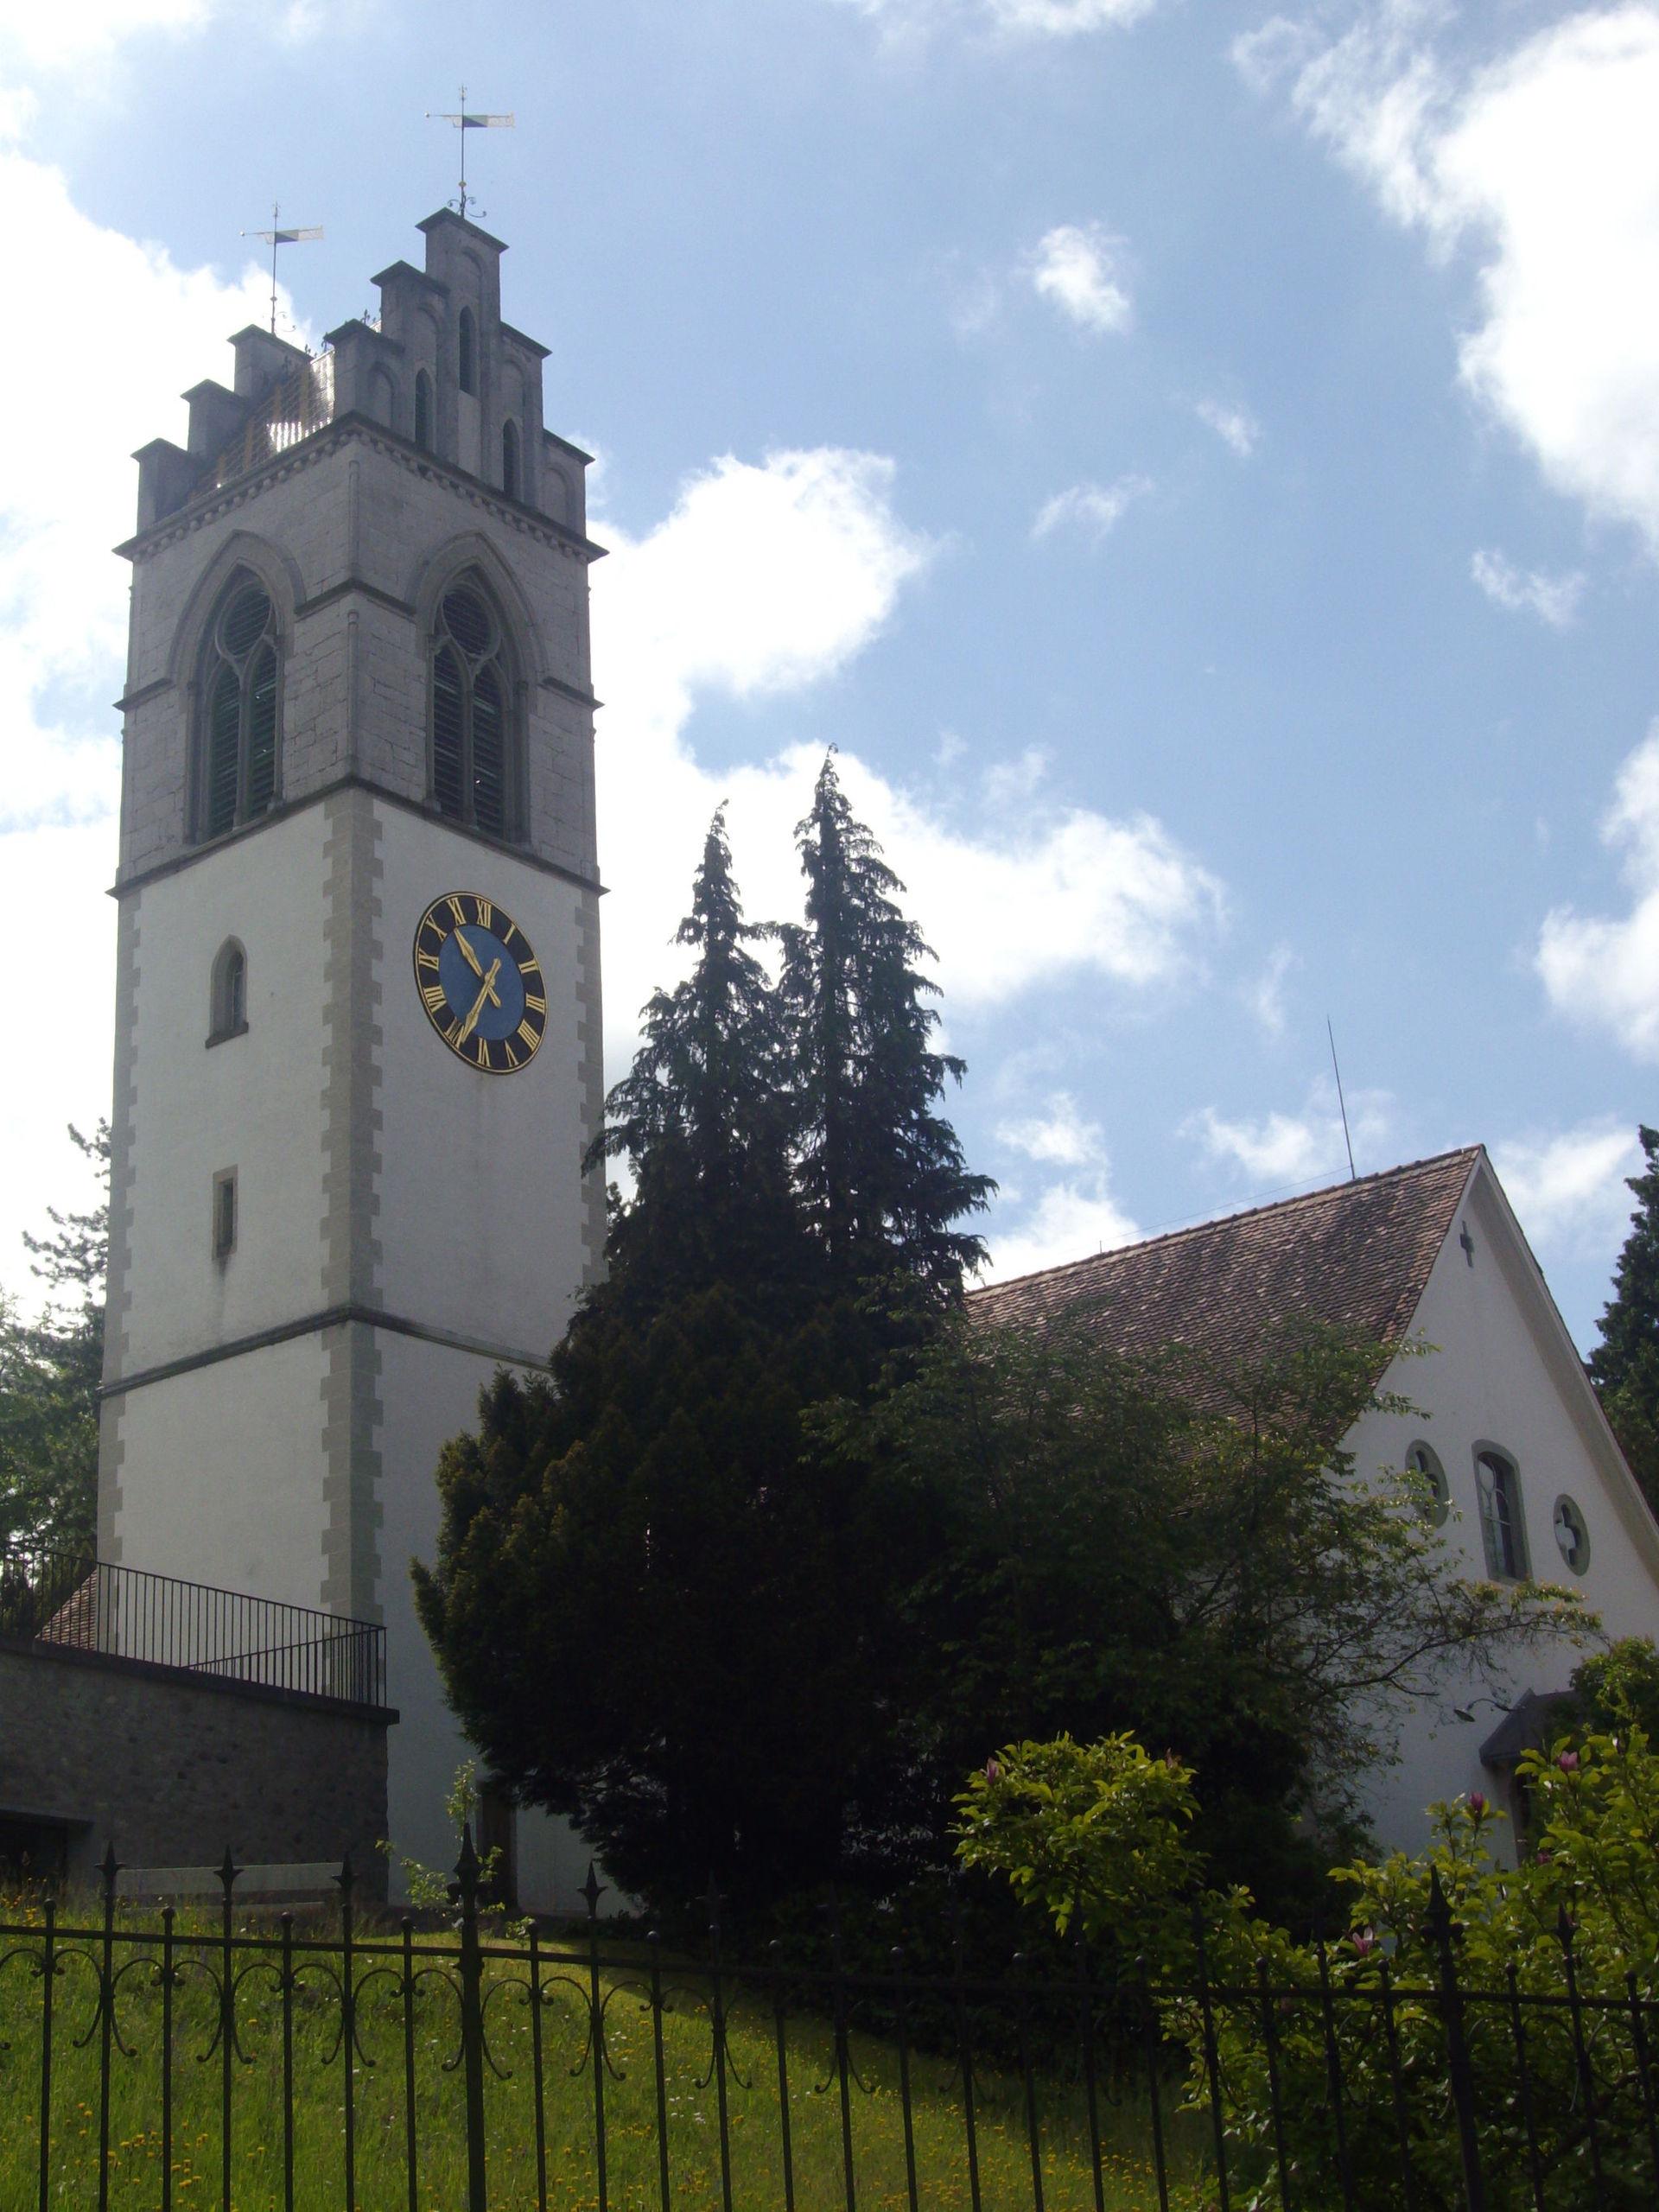 Reformierte kirche affoltern am albis wikipedia for Innendekoration affoltern am albis